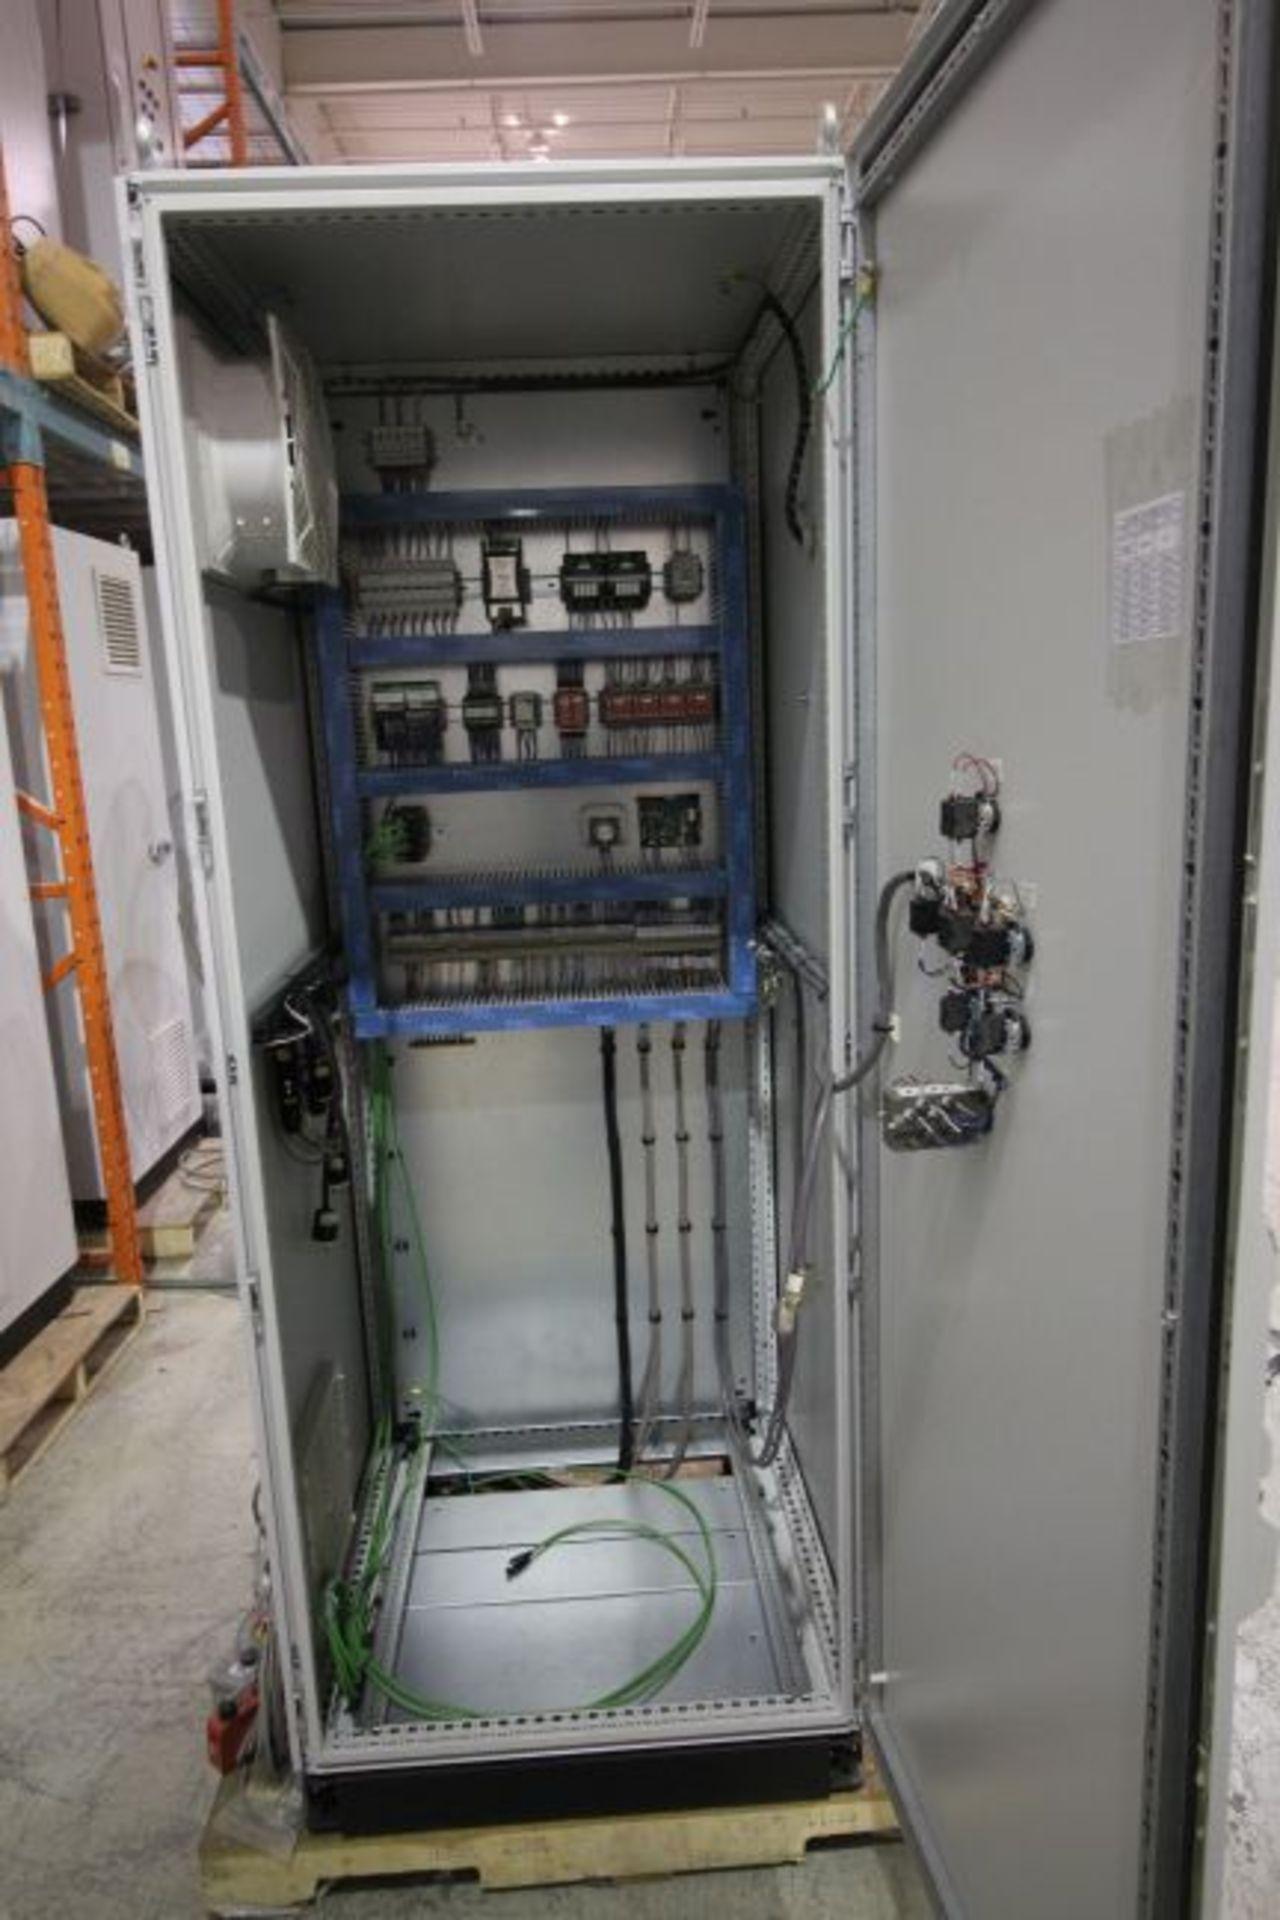 ABB DUAL ROBOT PLC CONTROLLER, MODEL 5108-910 - Image 2 of 6